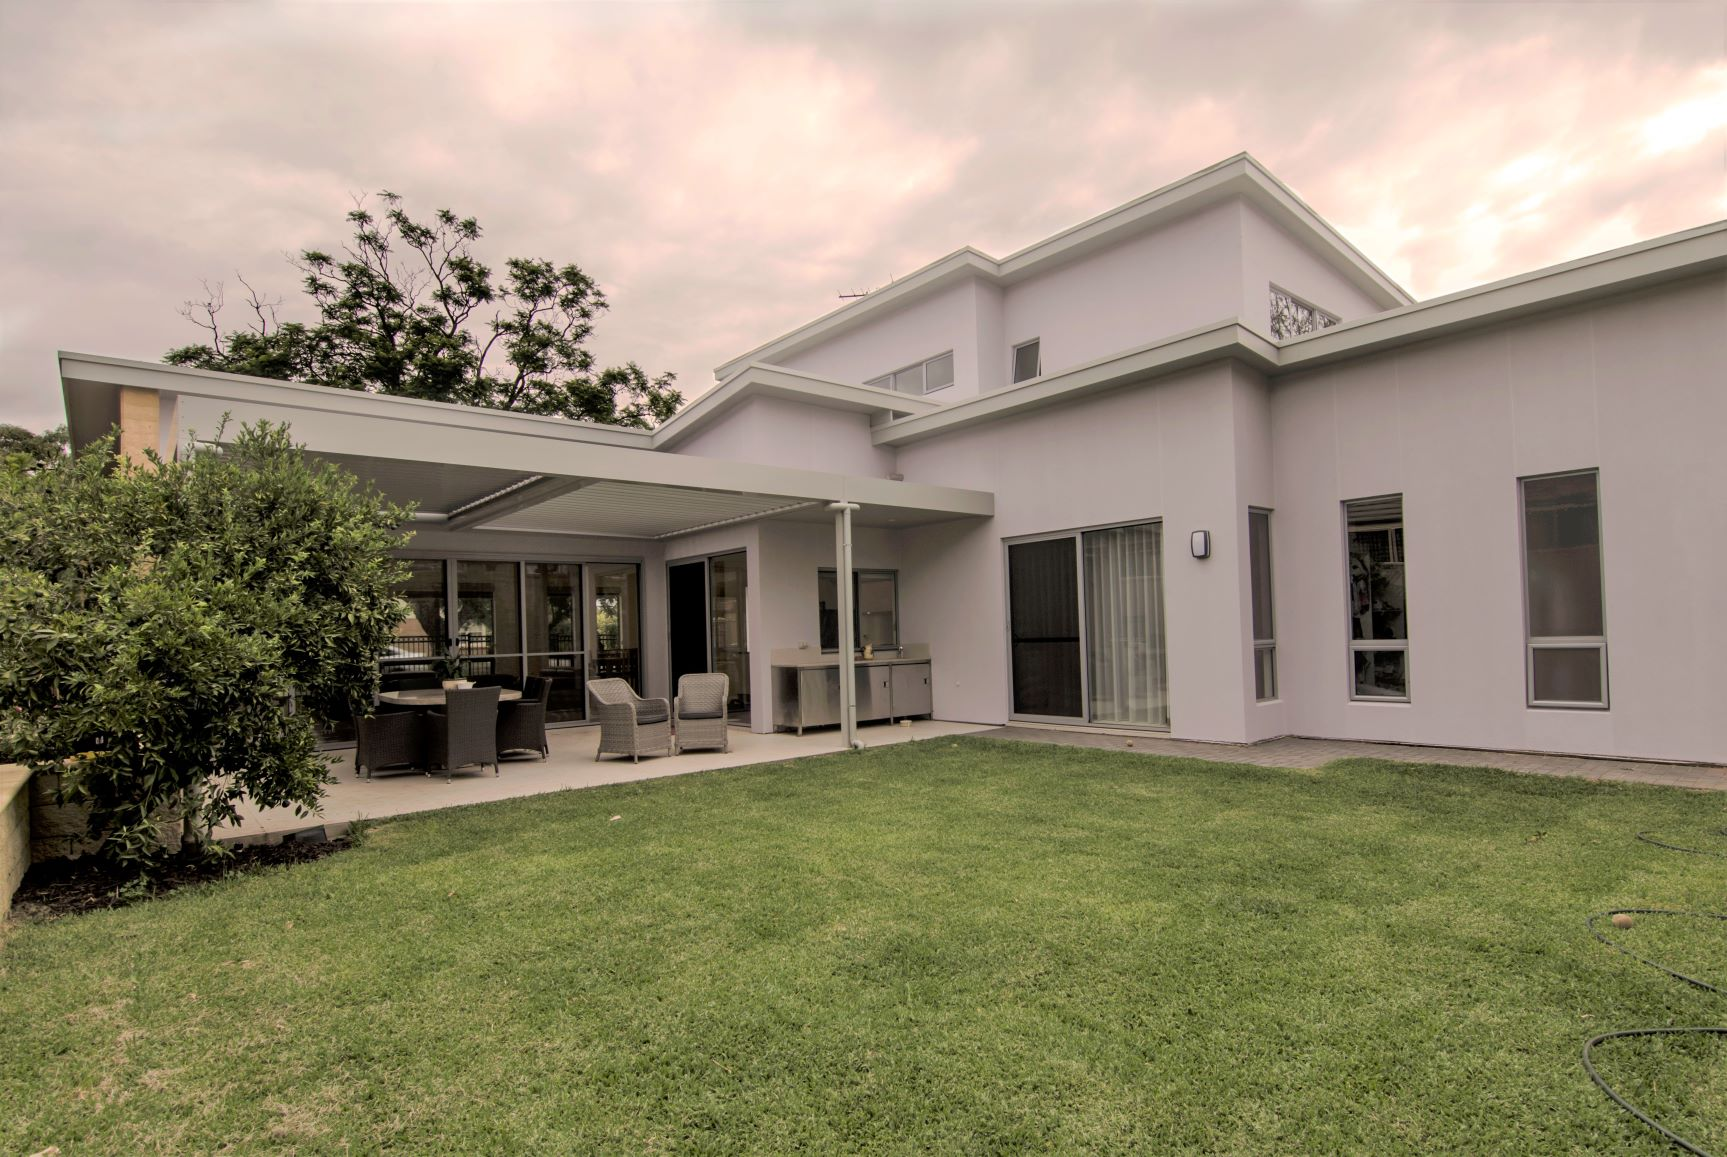 Custom Home, New Home, Family Home, Builders, Design, Tusmore, Adelaide, Two Storey, Outdoor Area